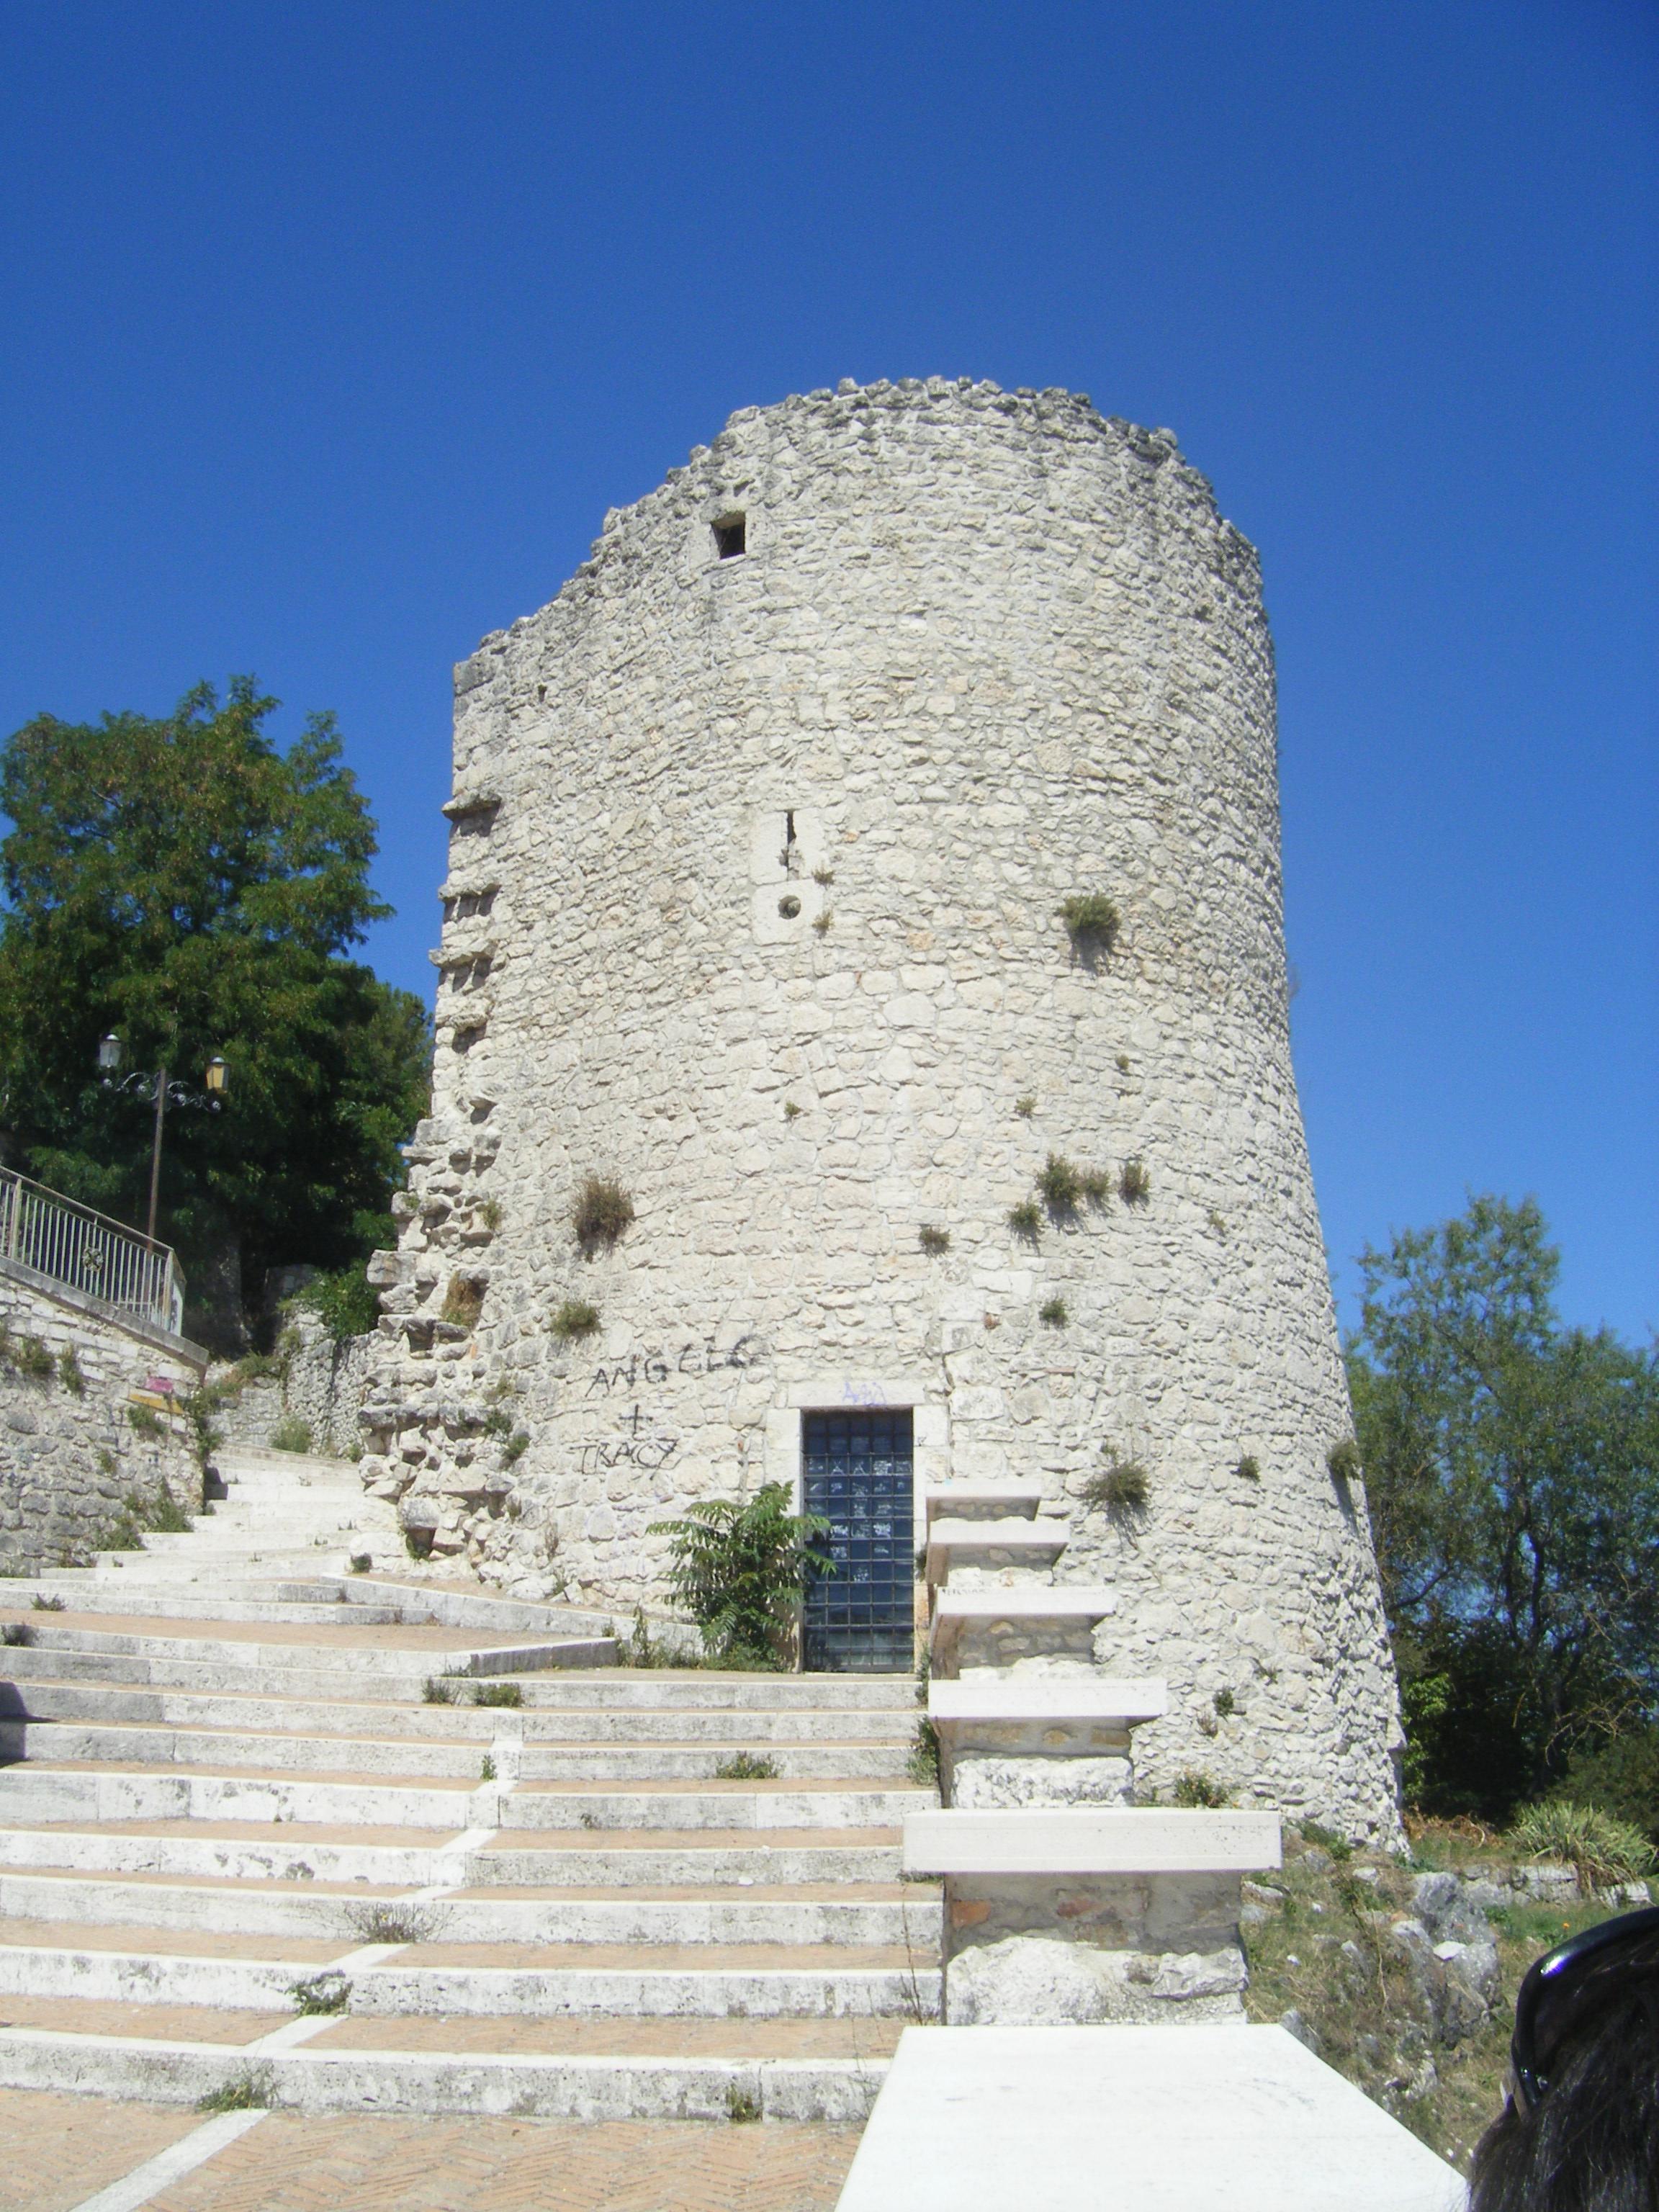 https://upload.wikimedia.org/wikipedia/commons/7/78/Torre_Terzano%2C_Campobasso.JPG